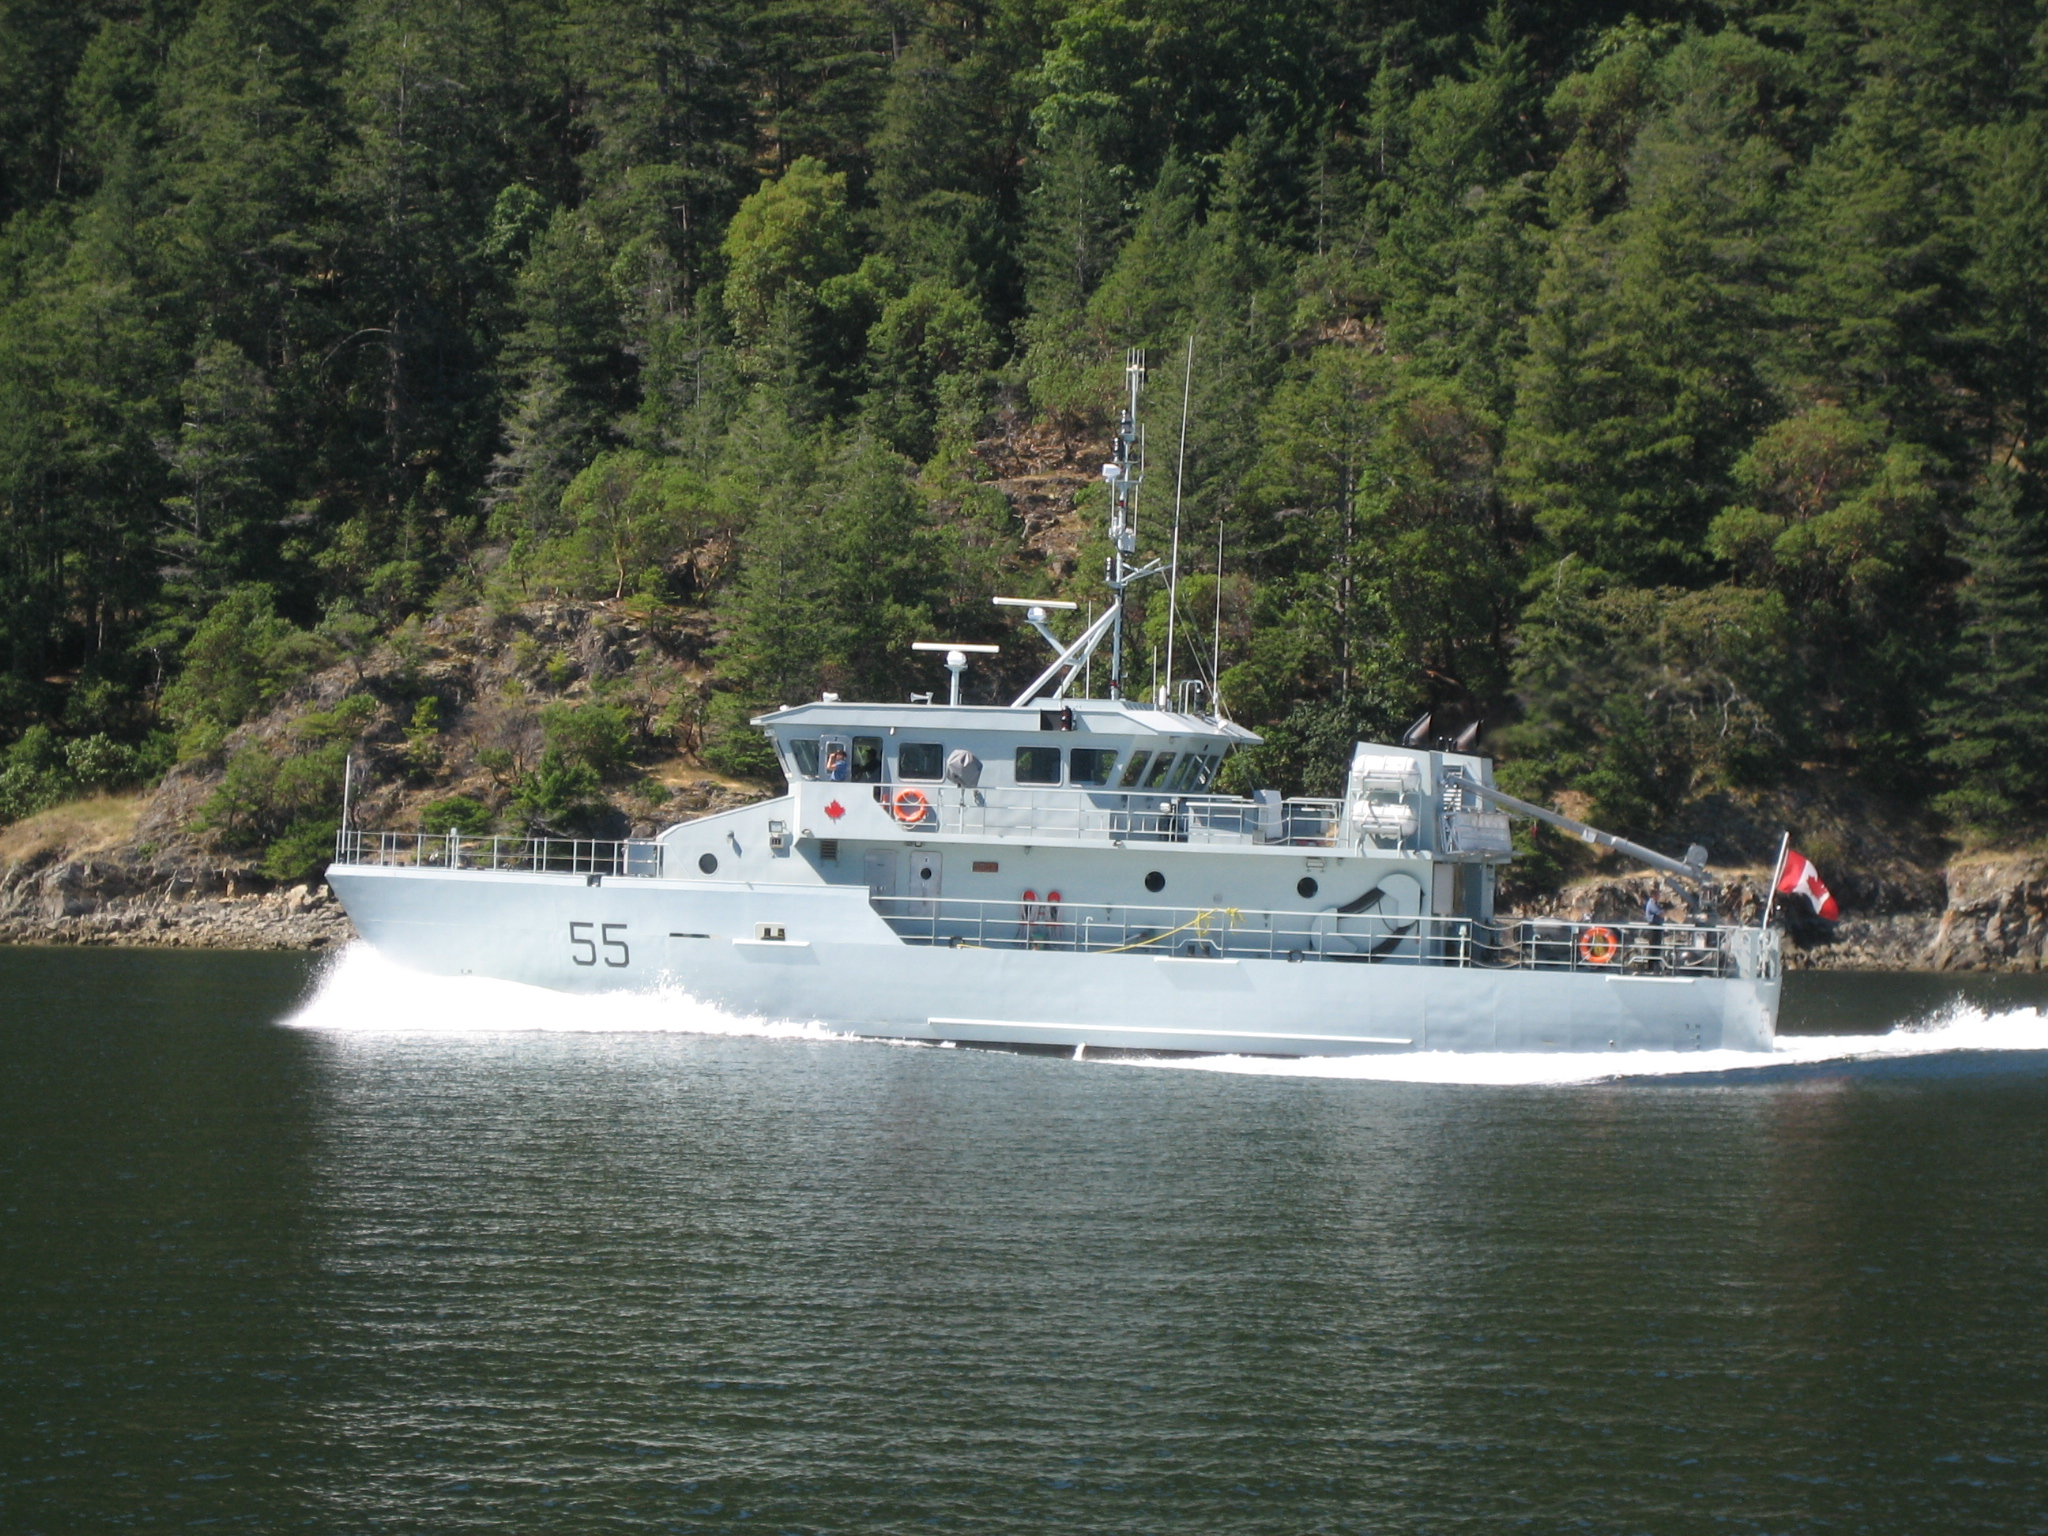 Orca (PCT 55)